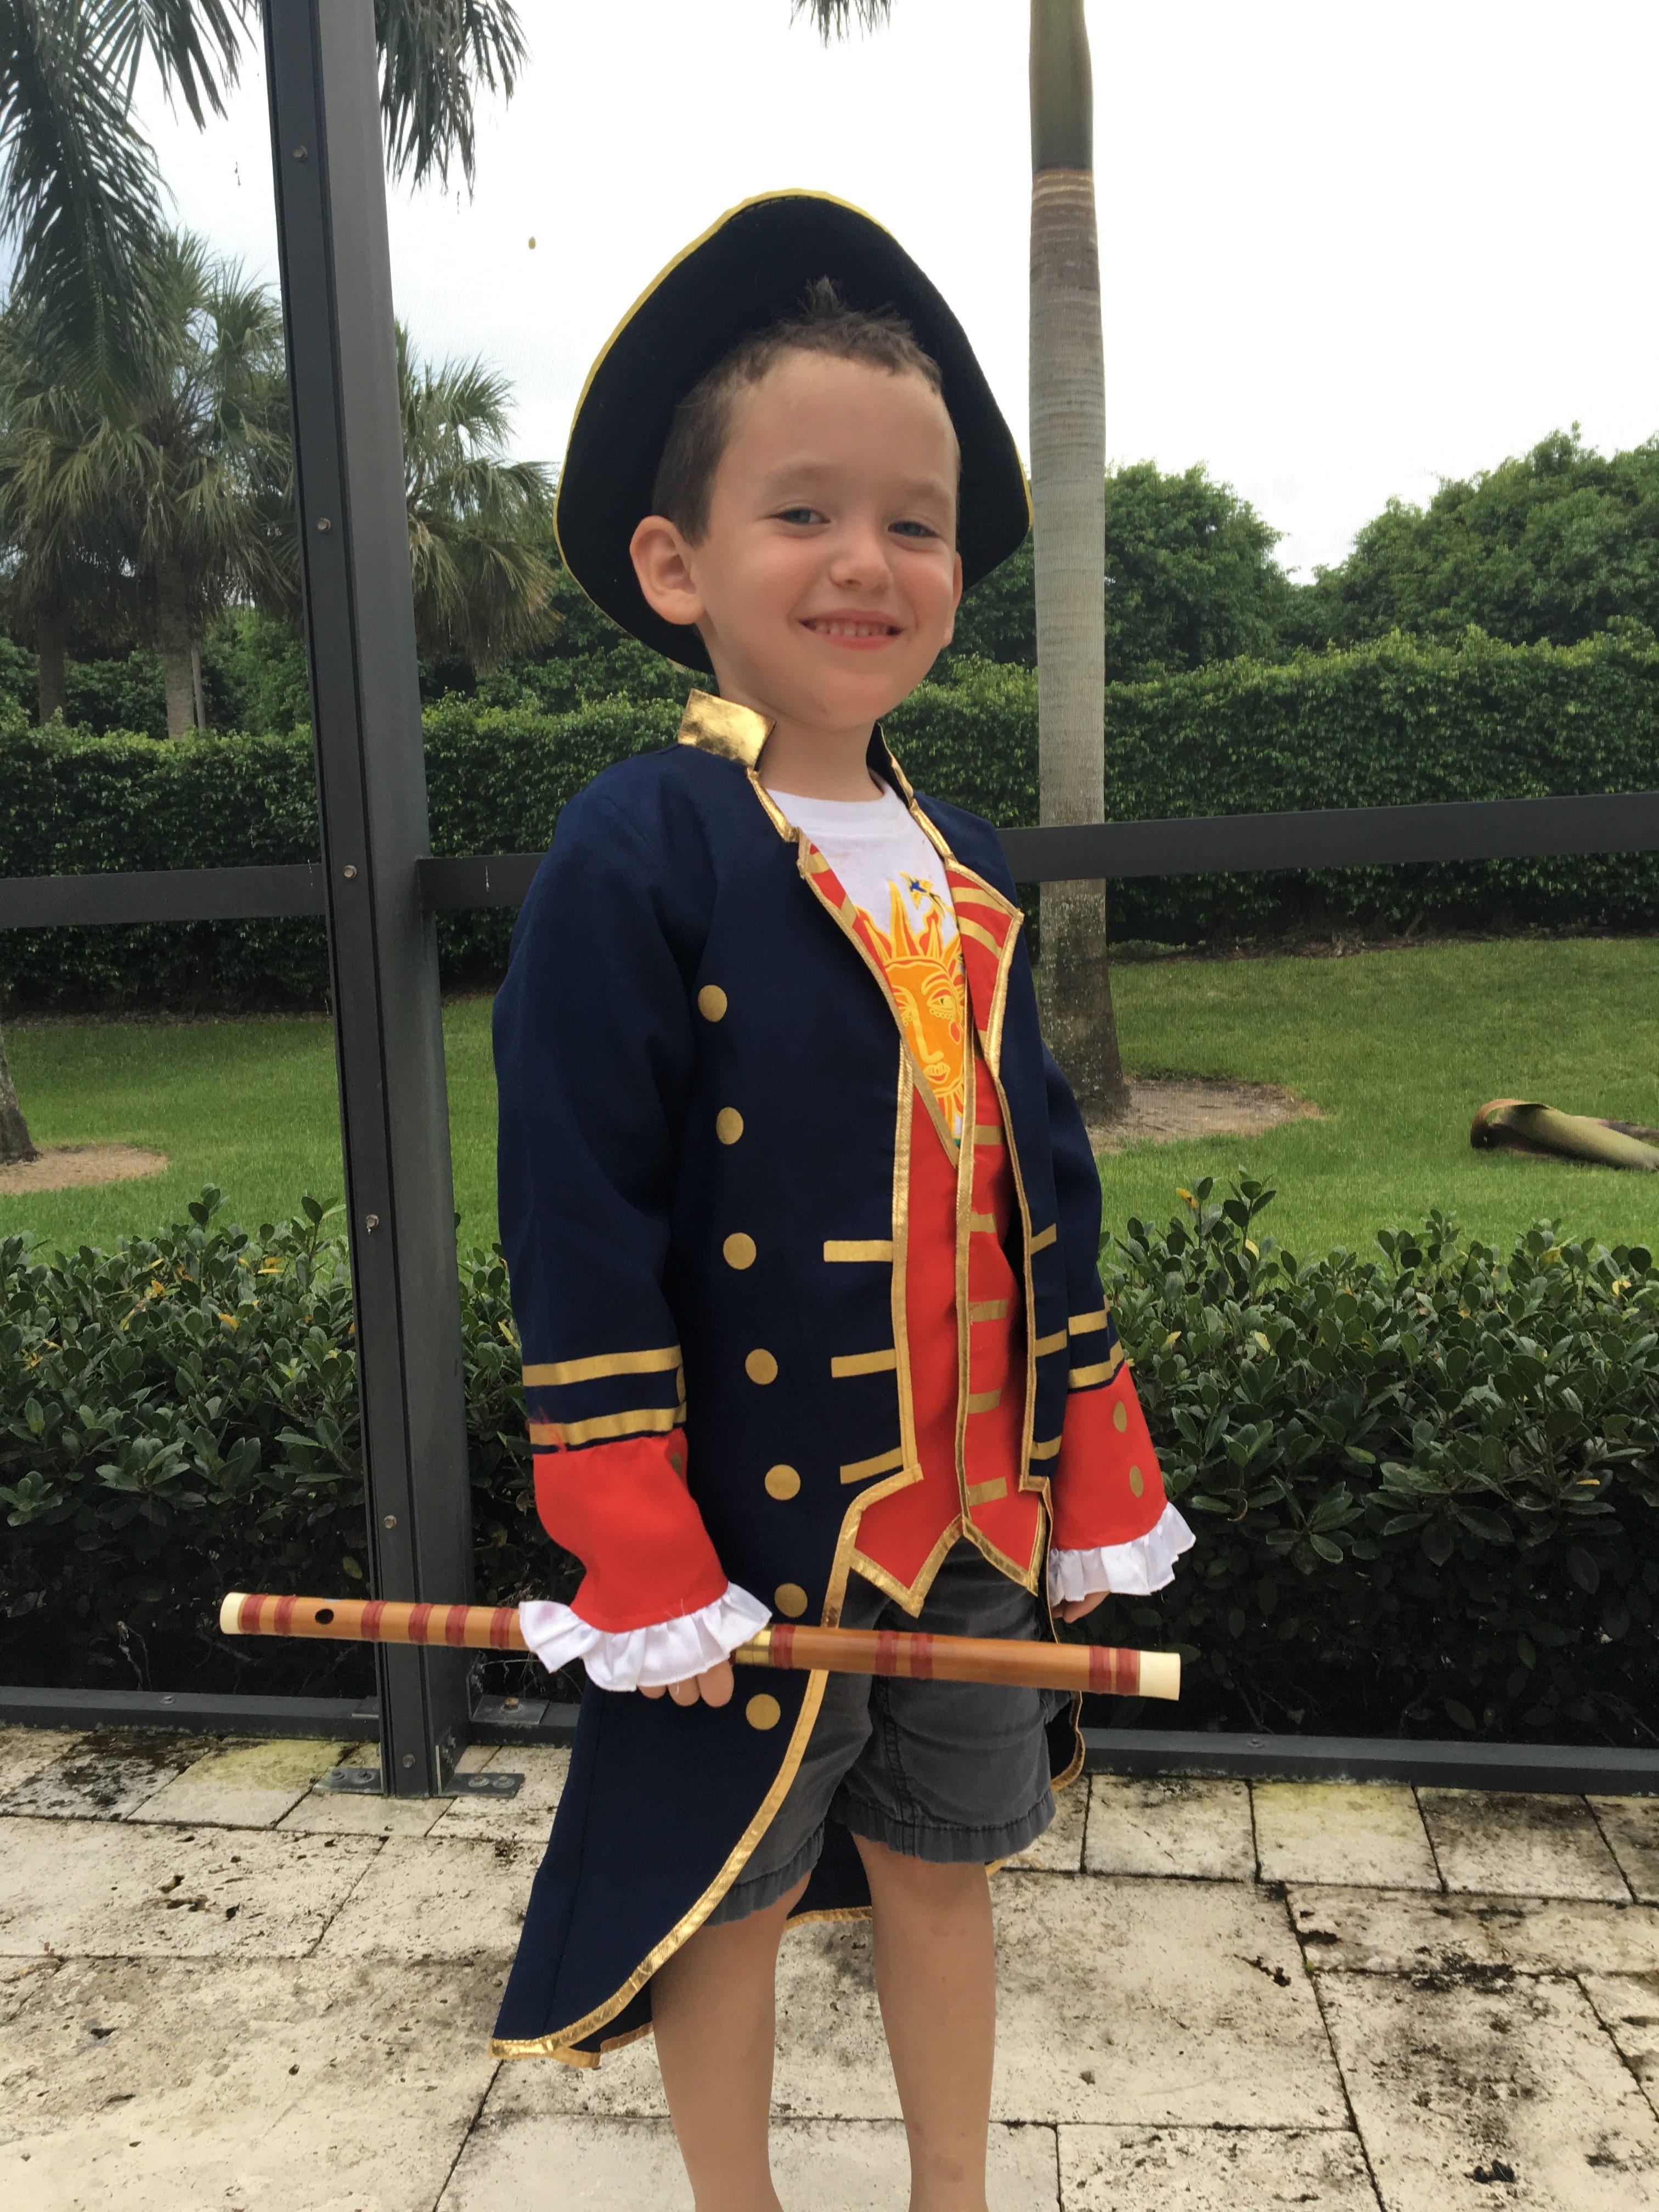 Thomas, the Patriot